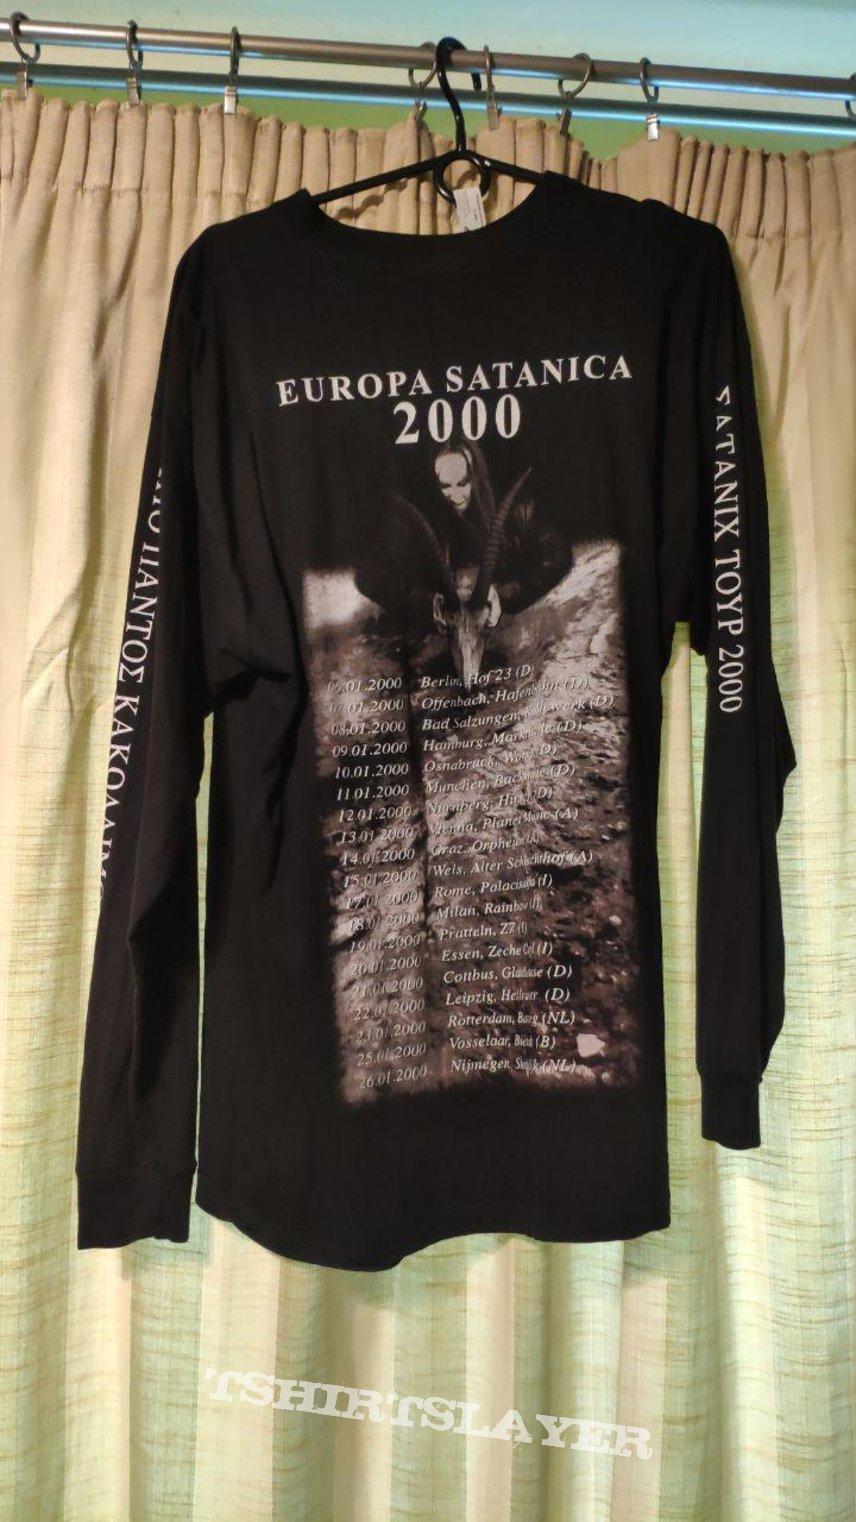 Behemoth - Europa Satanica 2000 Longsleeve Avantgarde